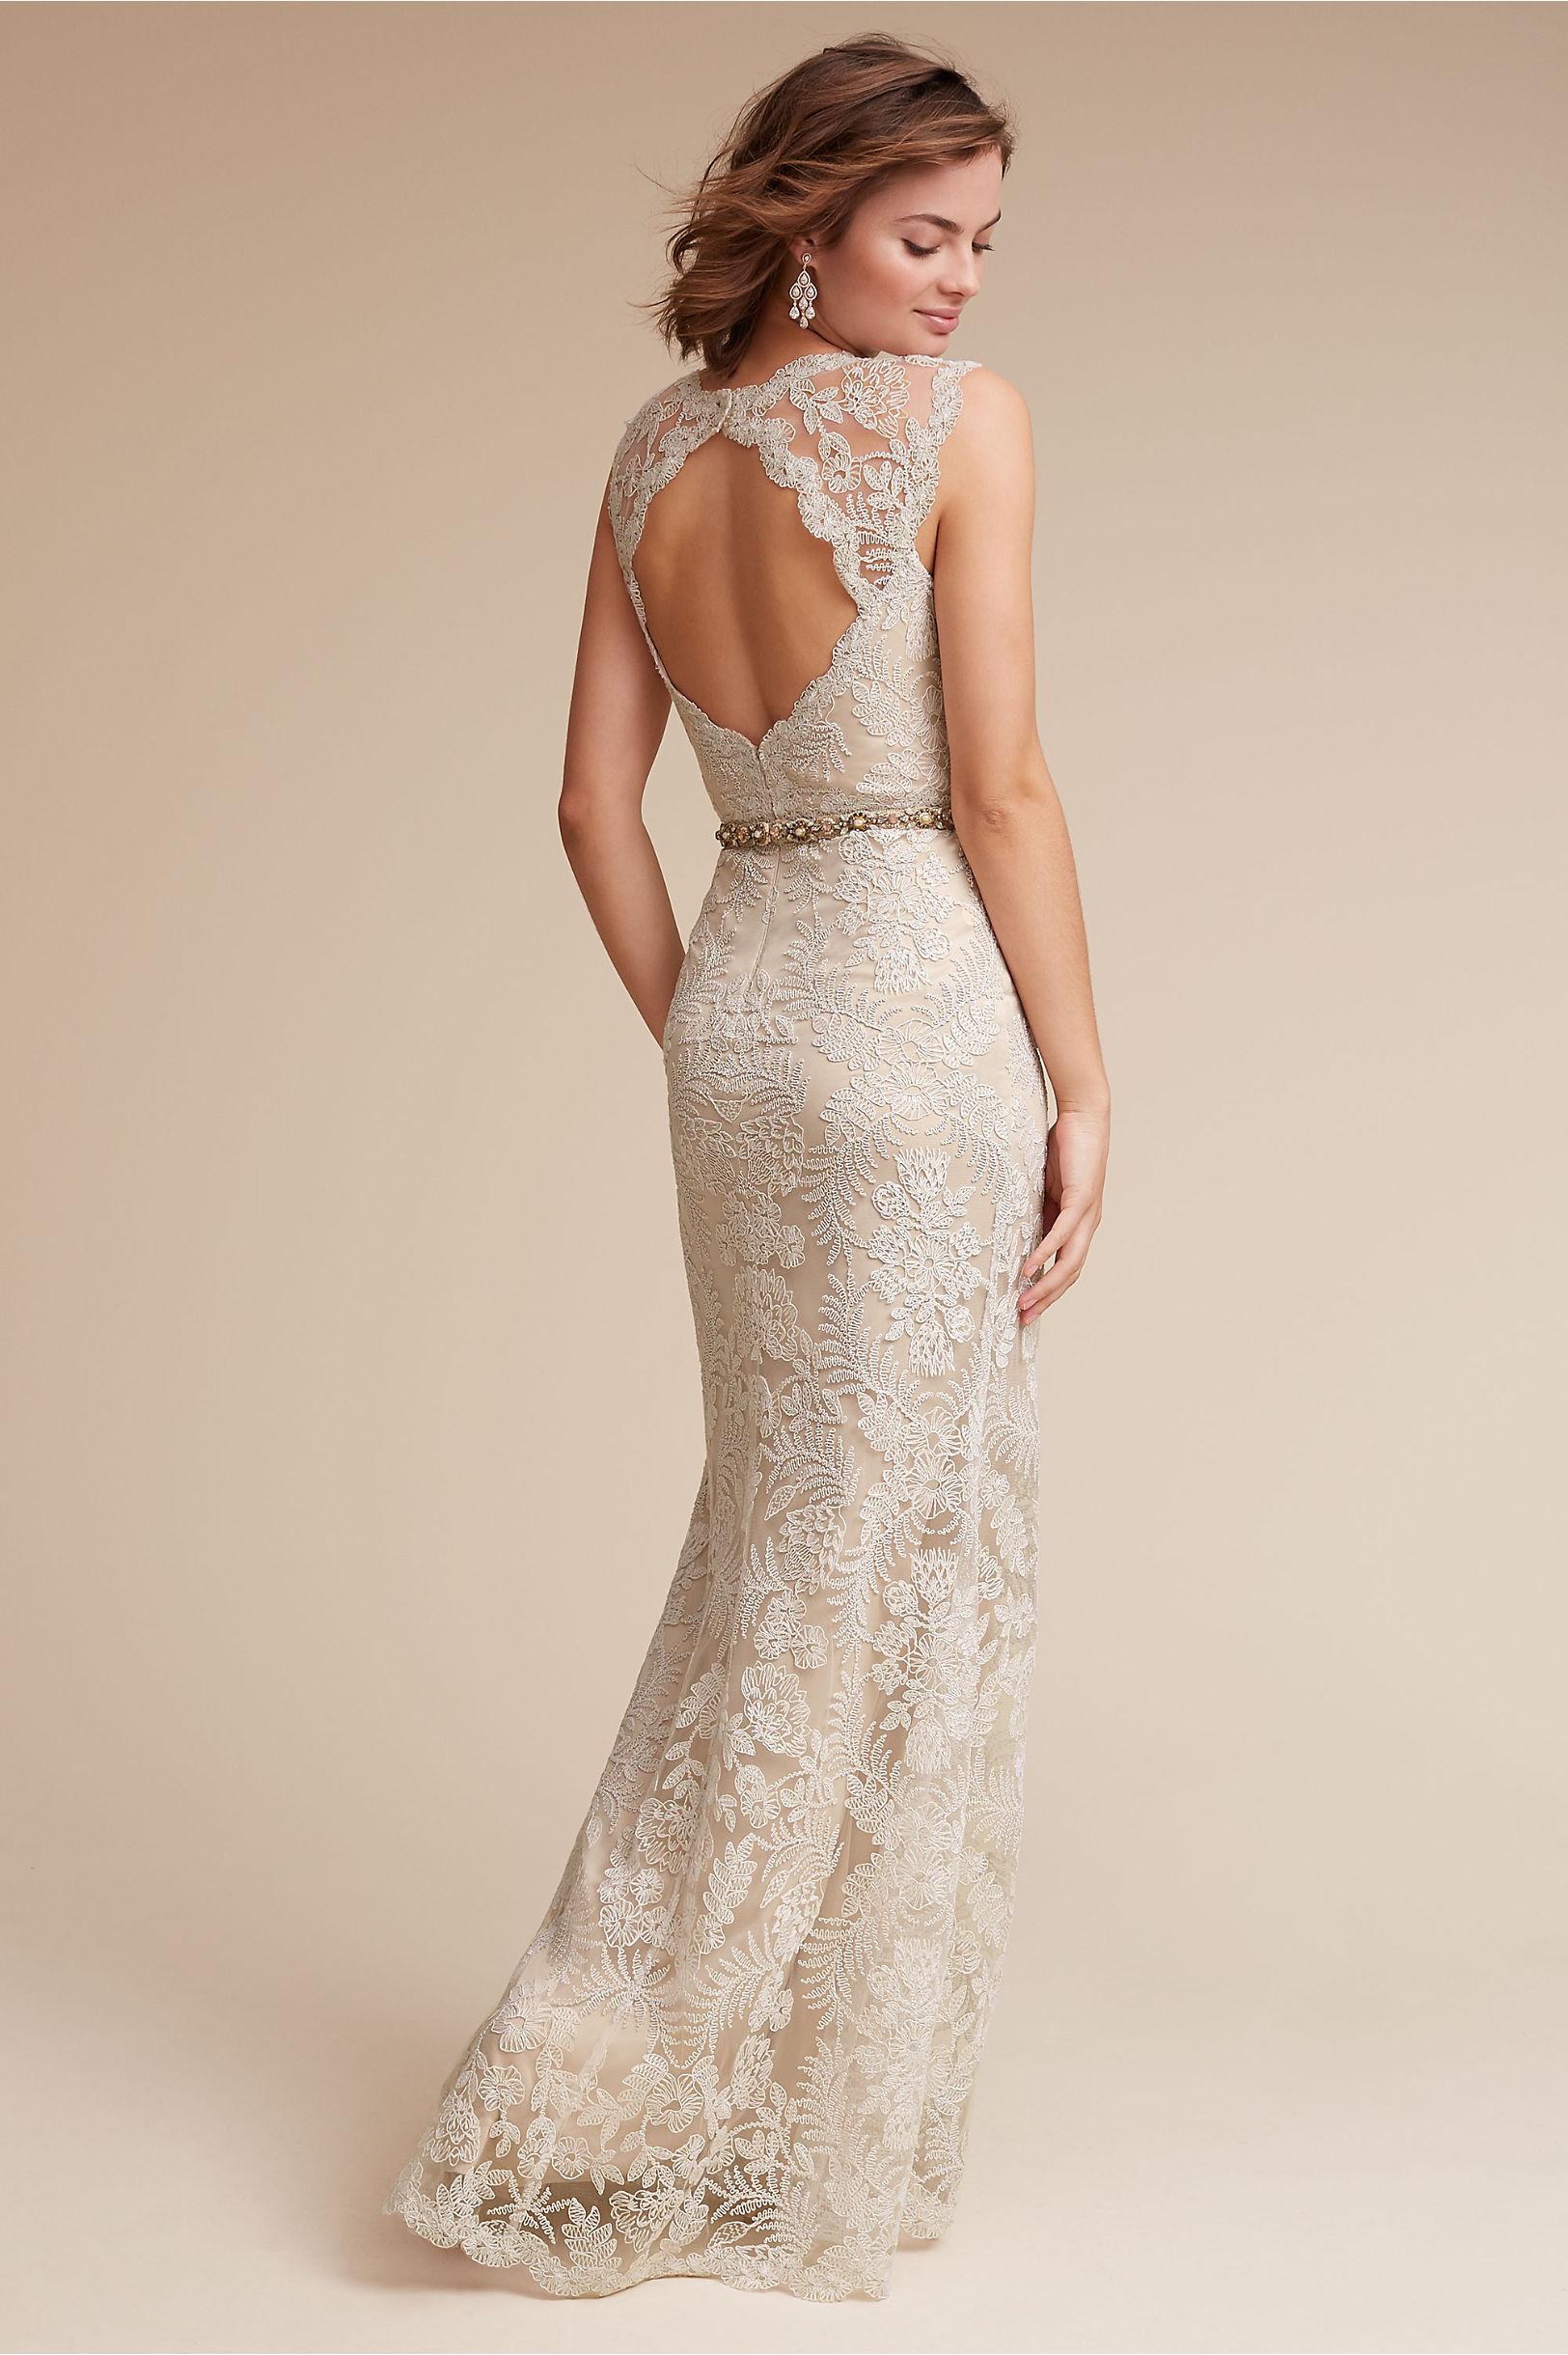 Shop wedding dresses on sale wedding dress clearance bhldn april gown ombrellifo Gallery